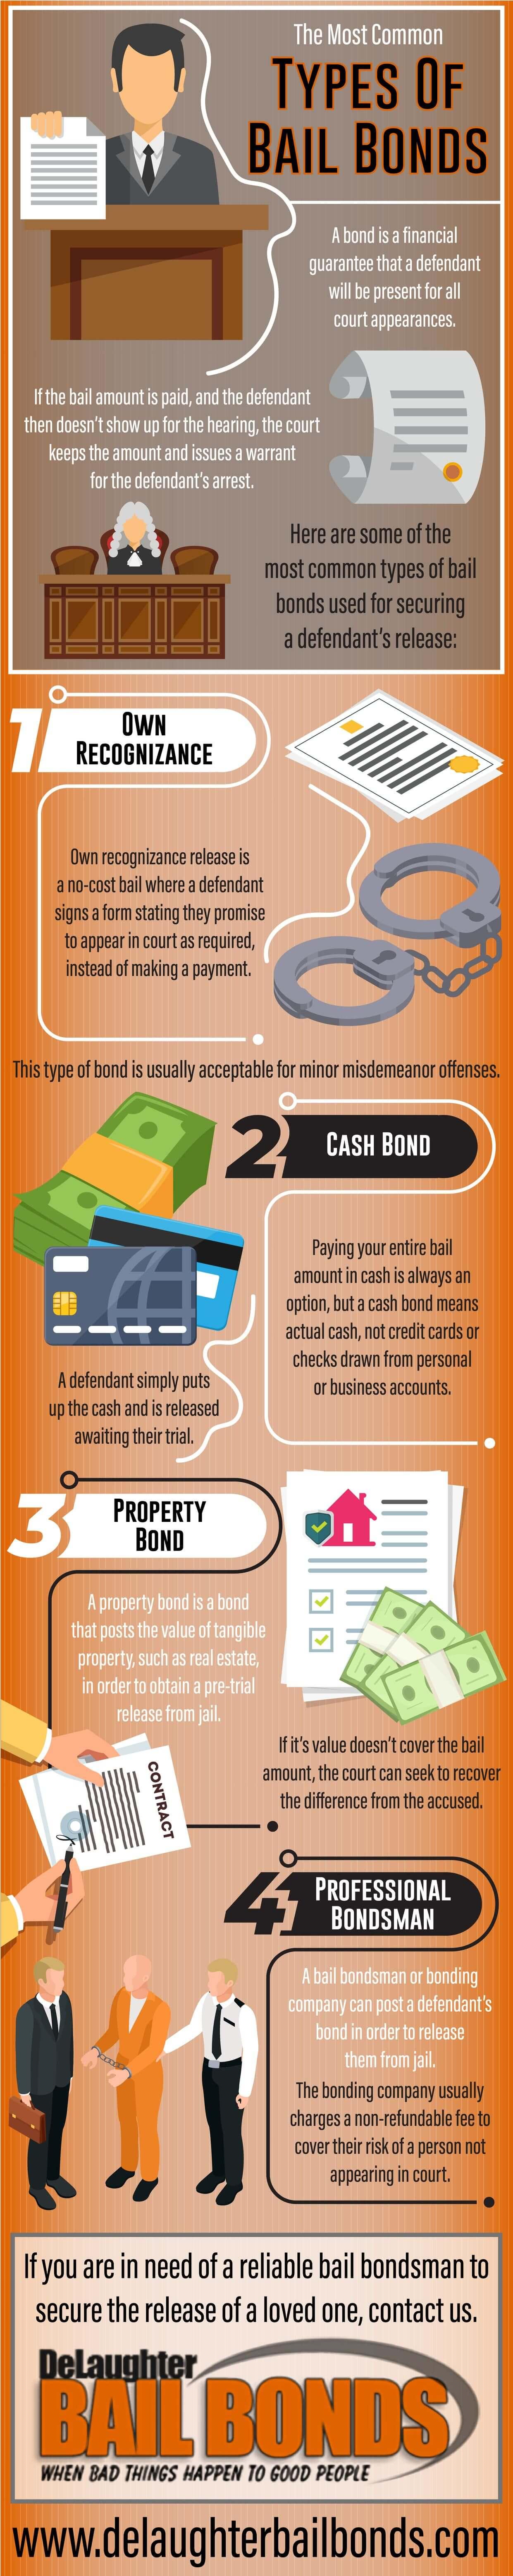 bail bond types